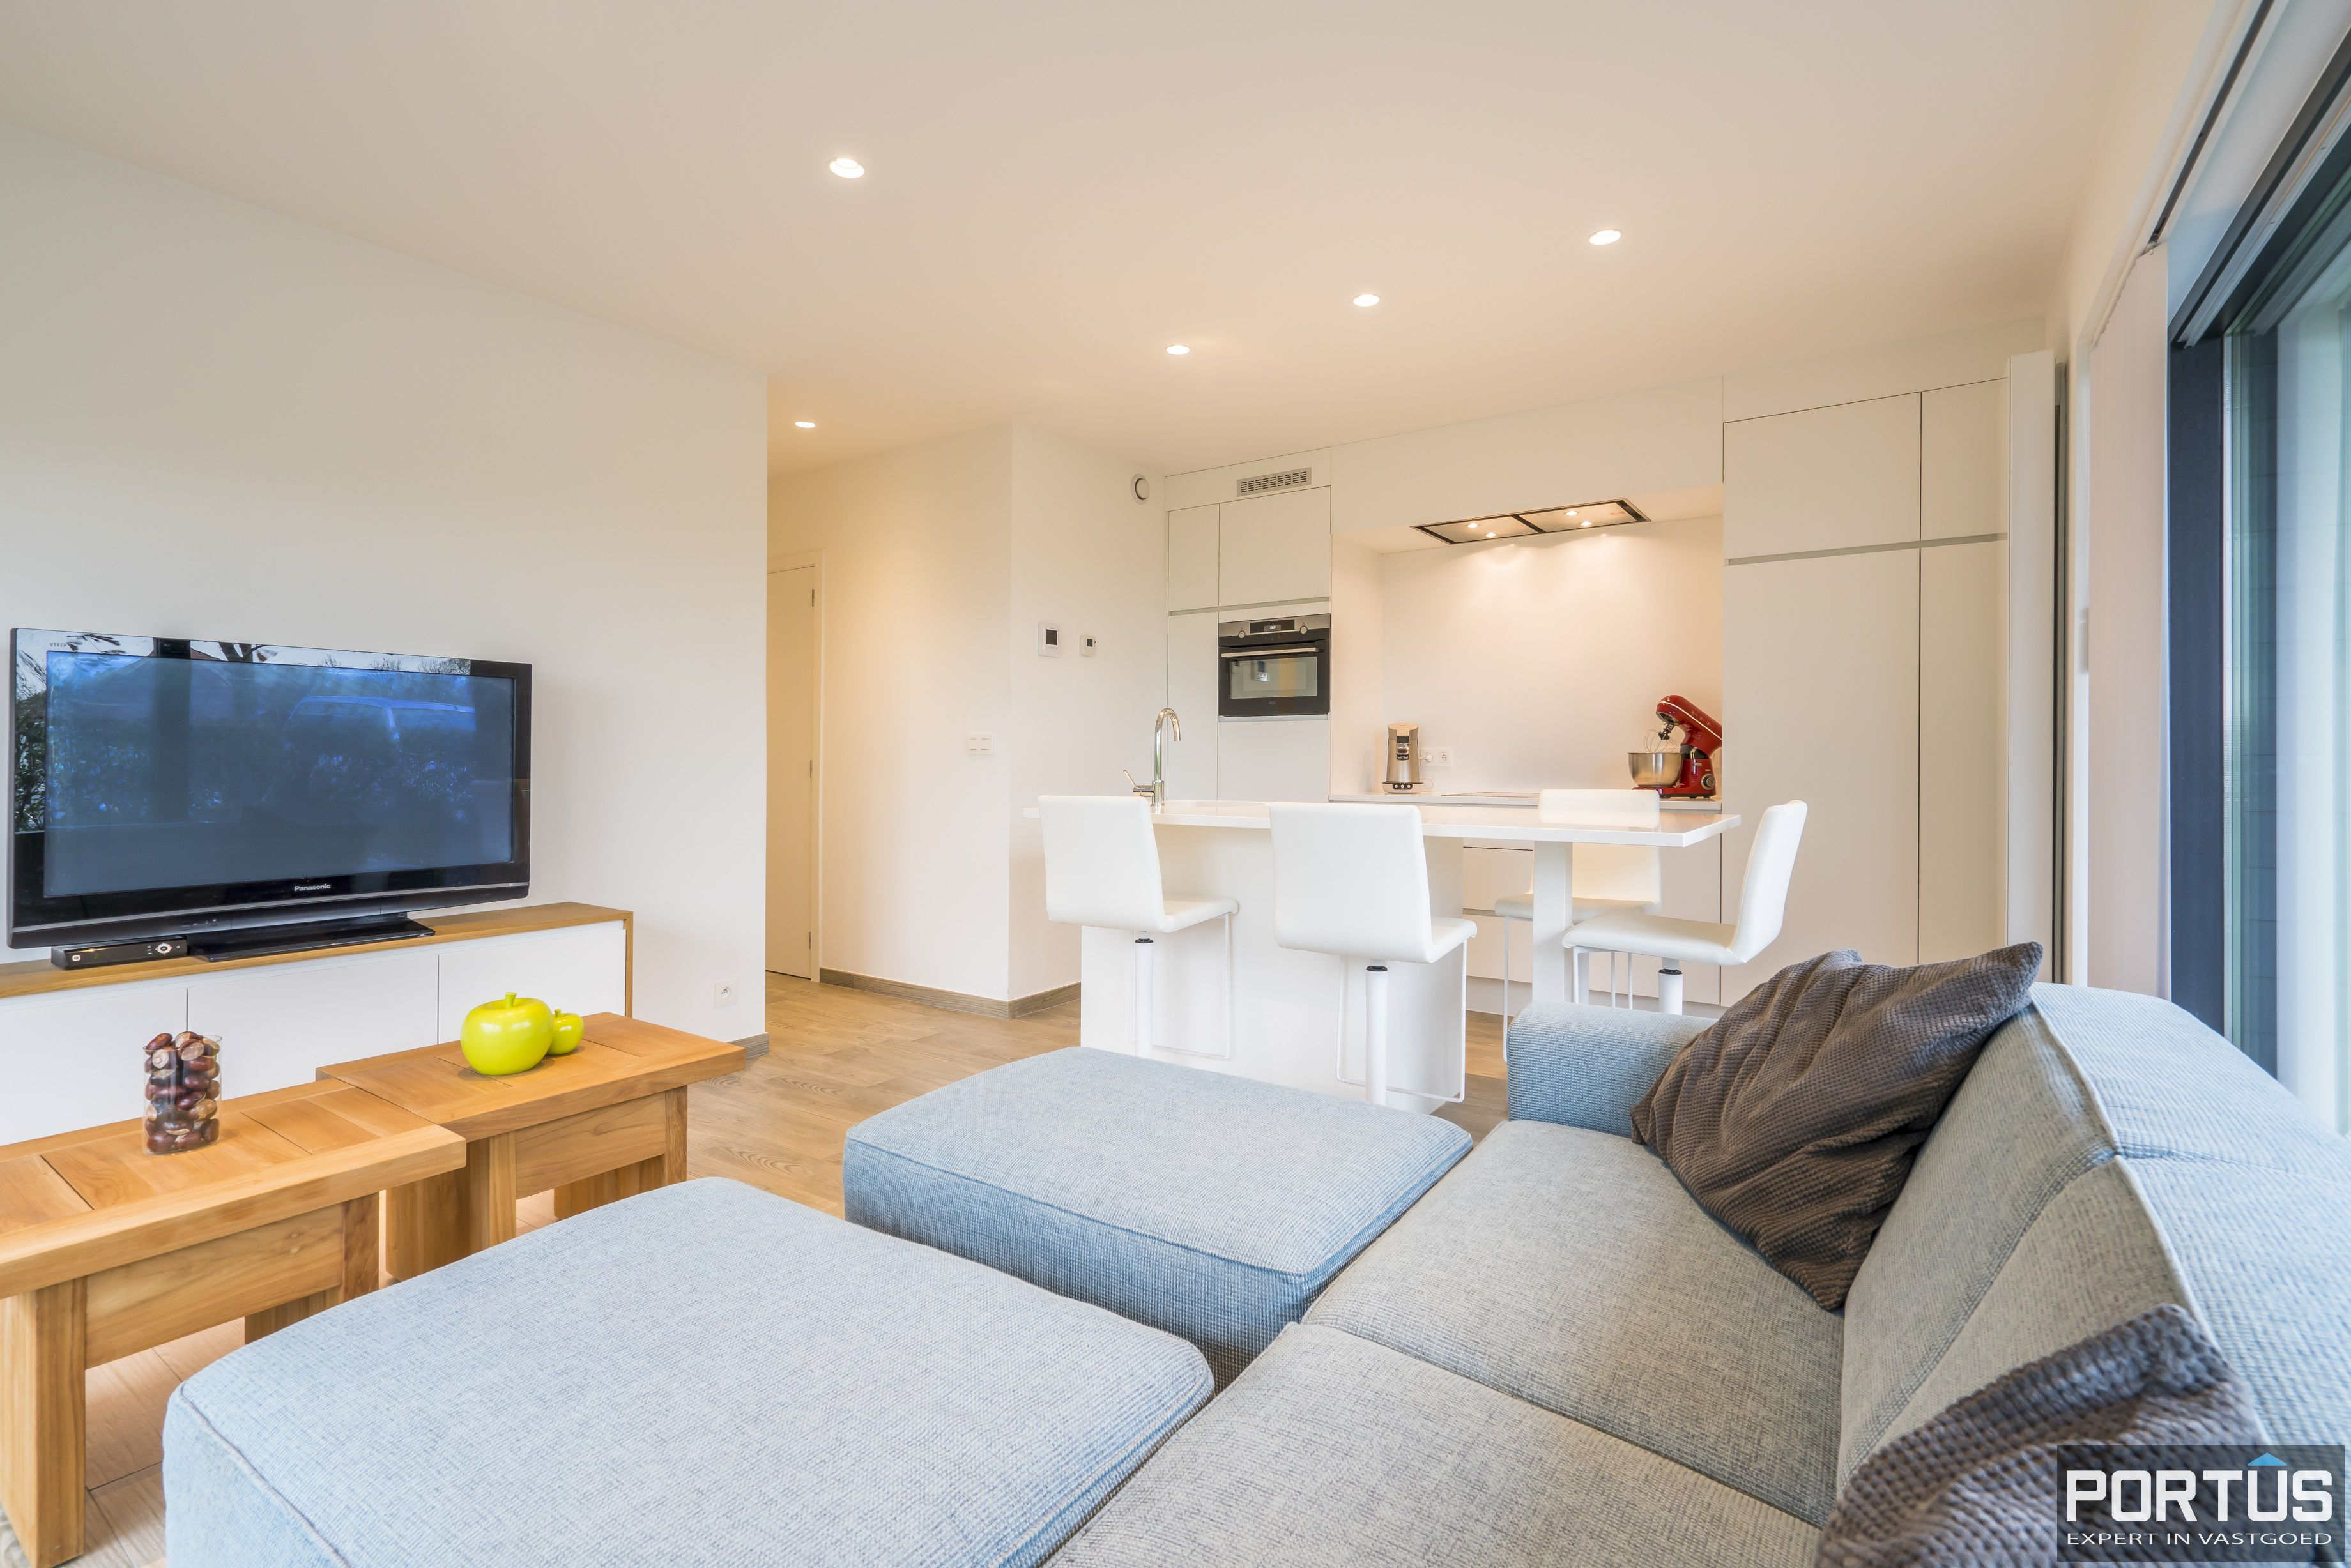 Appartement te koop met 2 slaapkamers in Residentie Waterfront te Nieuwpoort - 11862